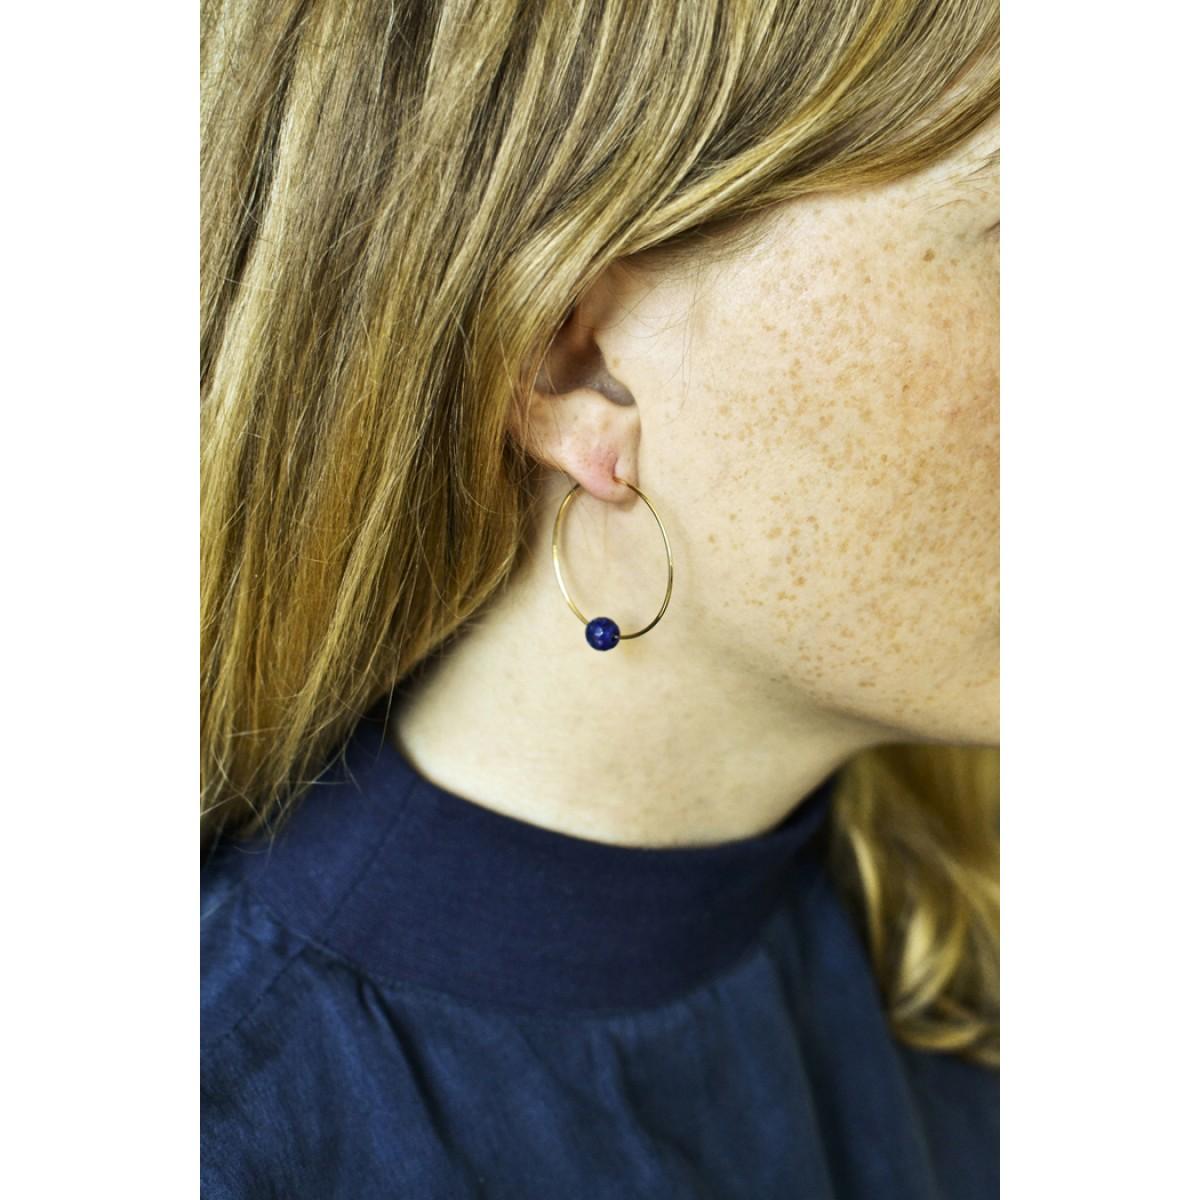 Gudbling // Zebra Jaspis Perlen mit 18k vergoldeten Ohrreifen